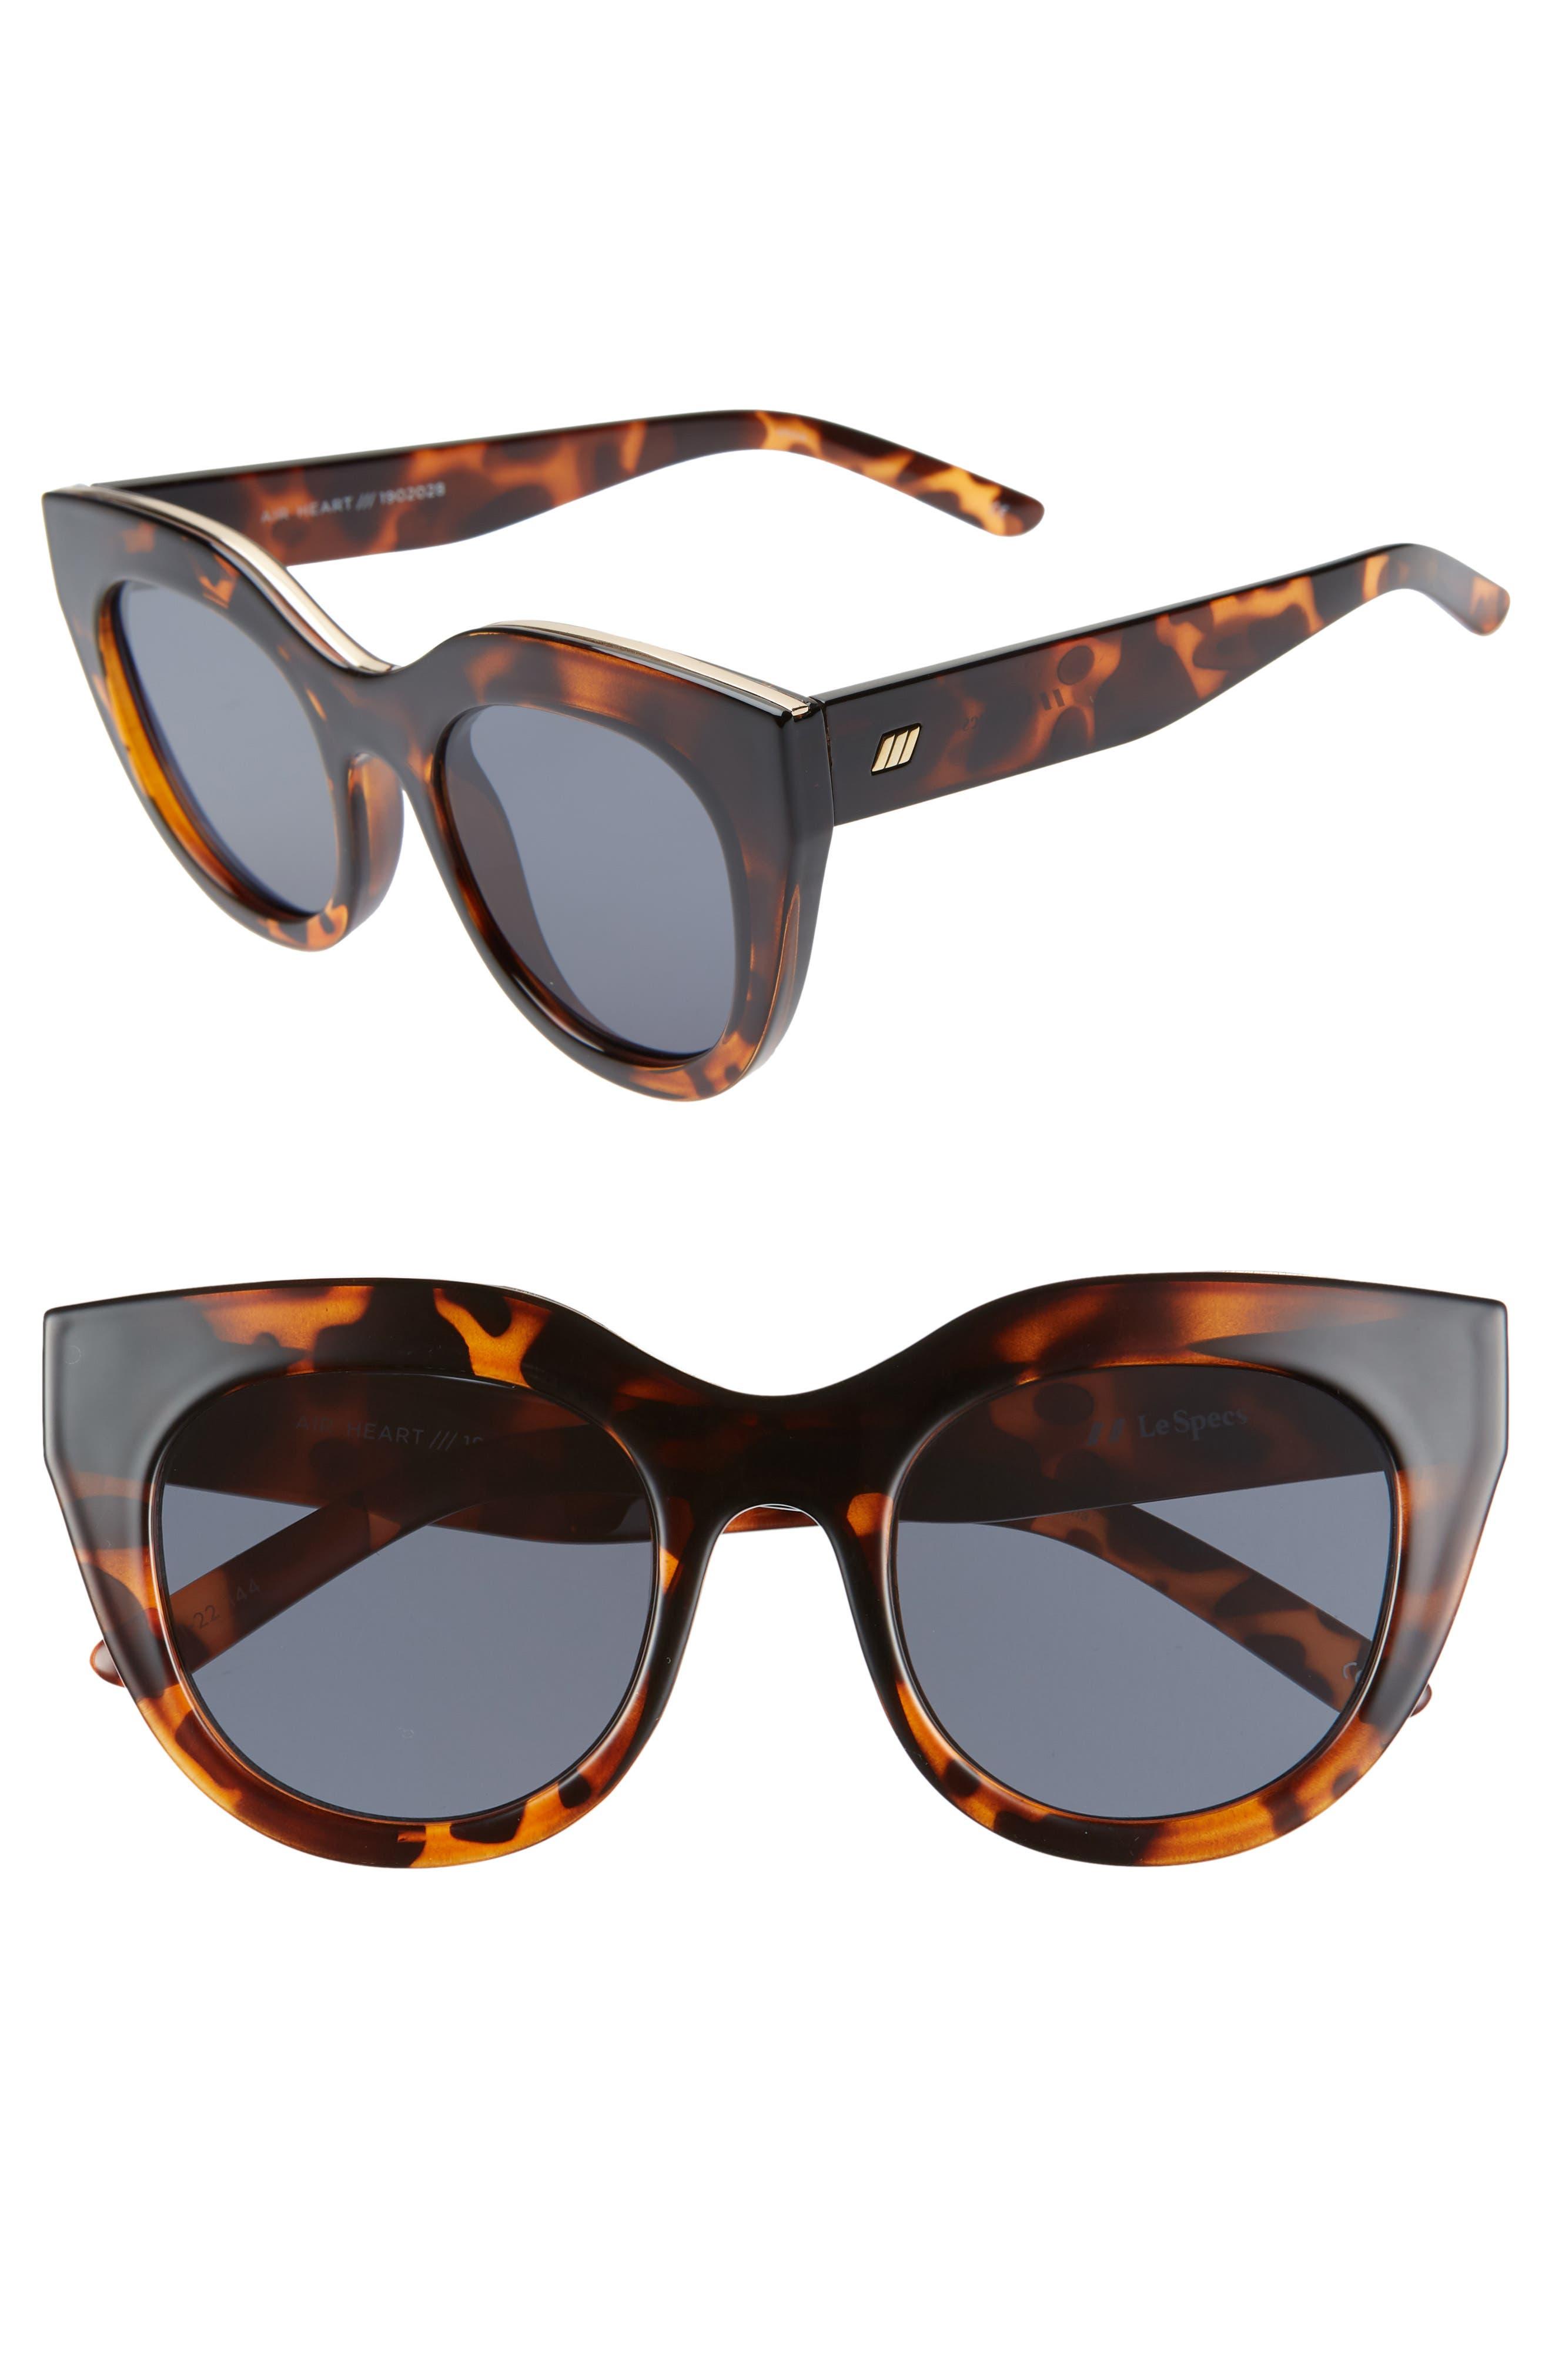 Le Specs Air Heart 51Mm Sunglasses - Tortoise/ Smoke